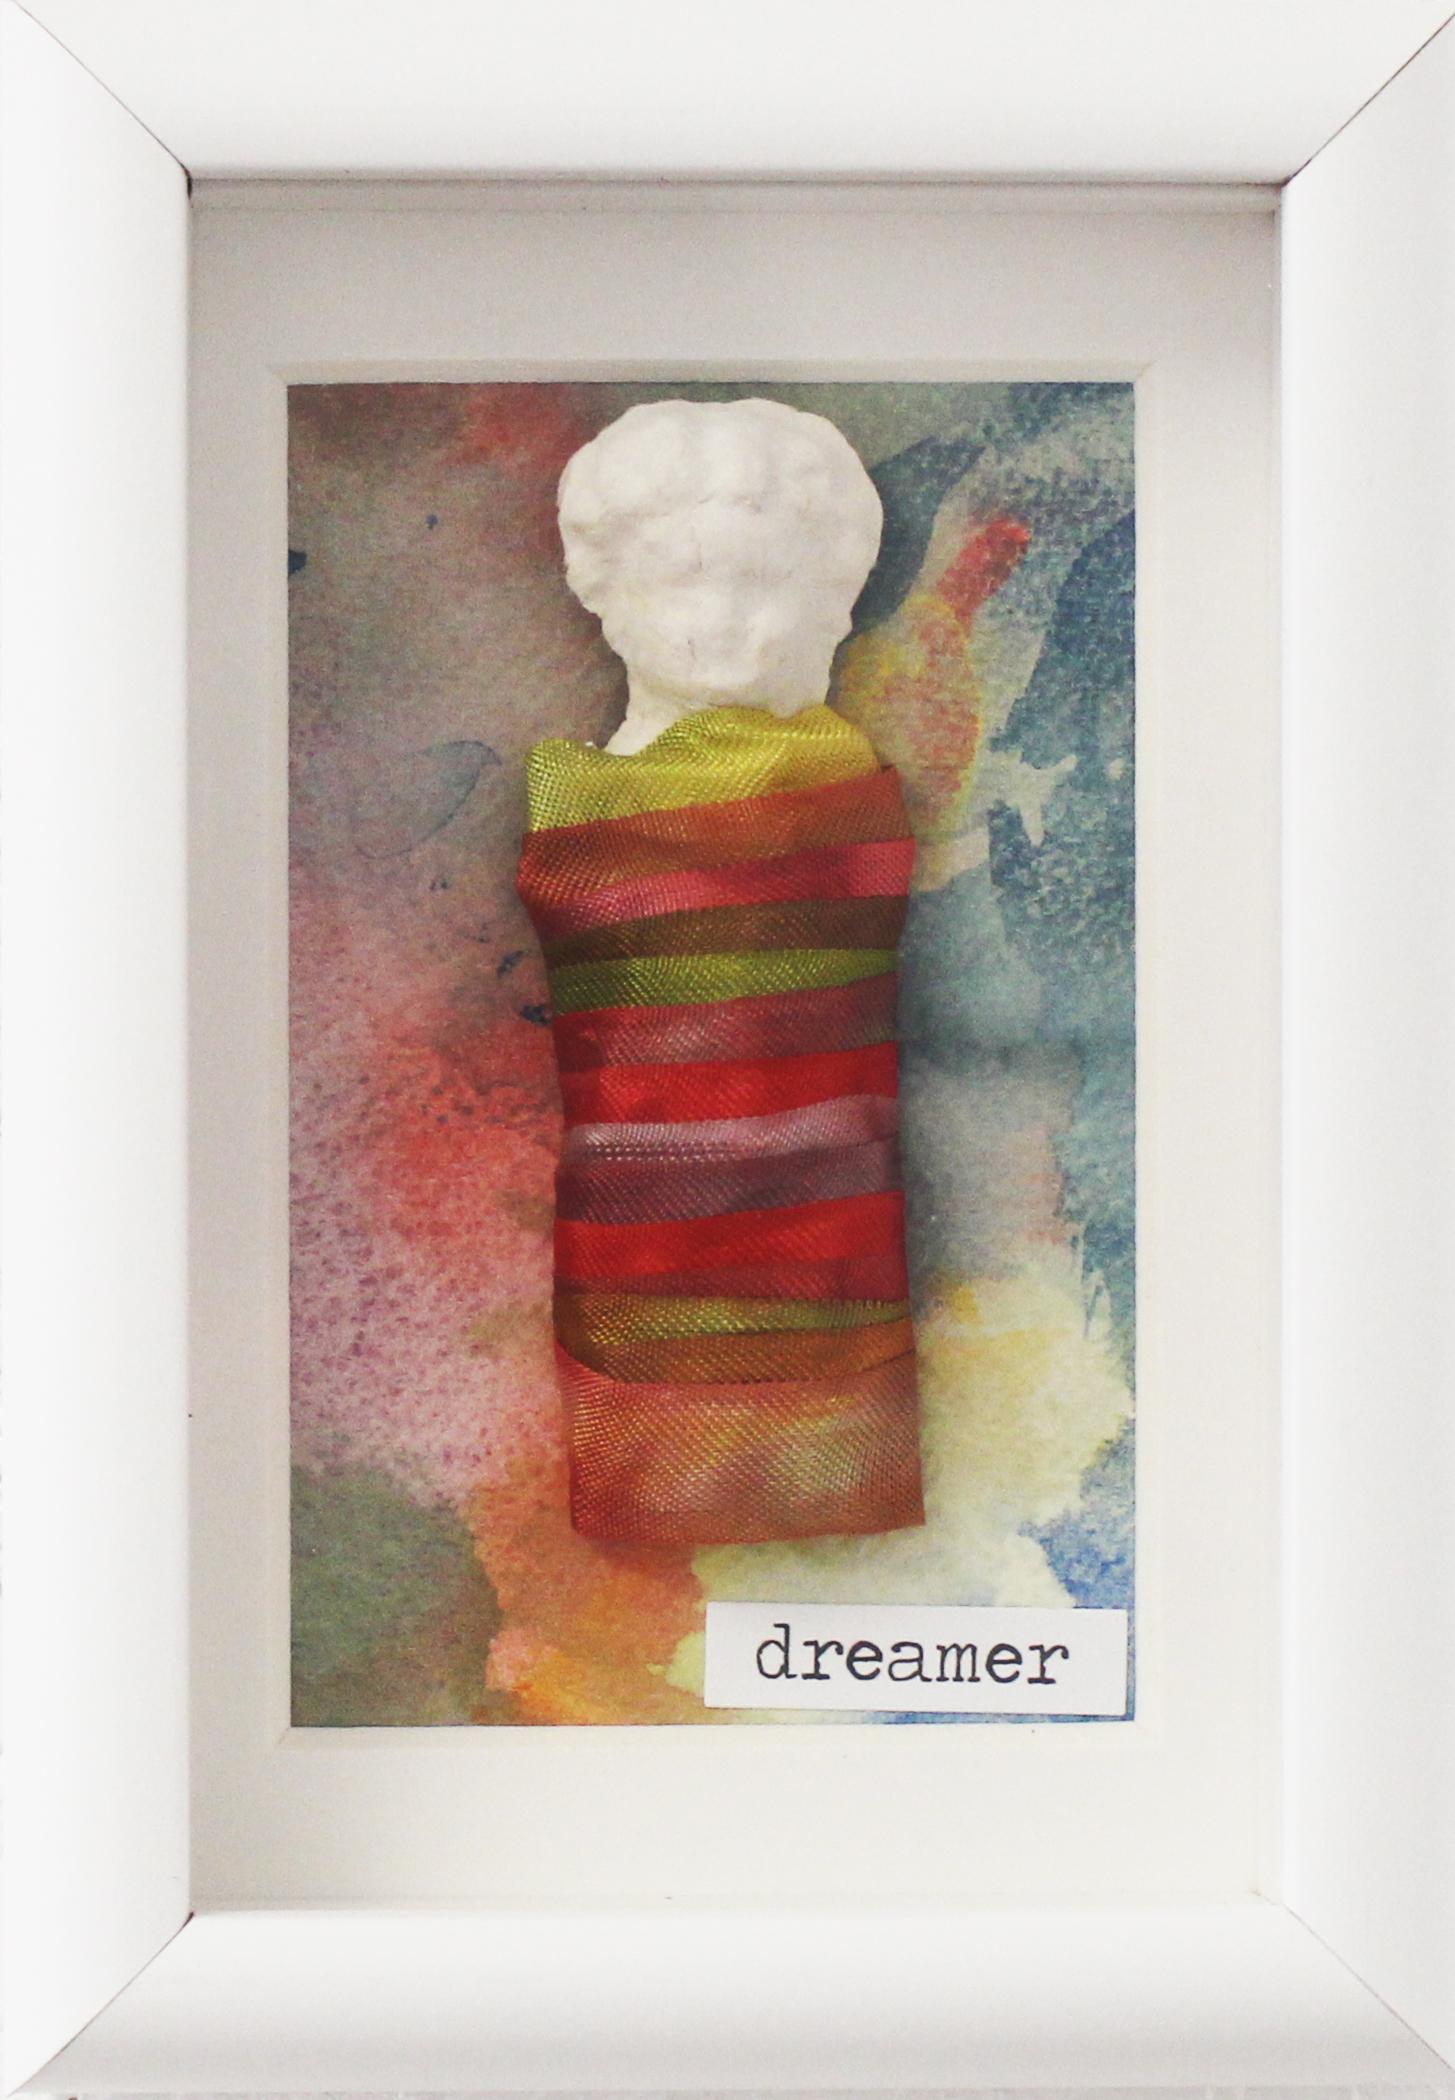 Stamos_Dreamer-1